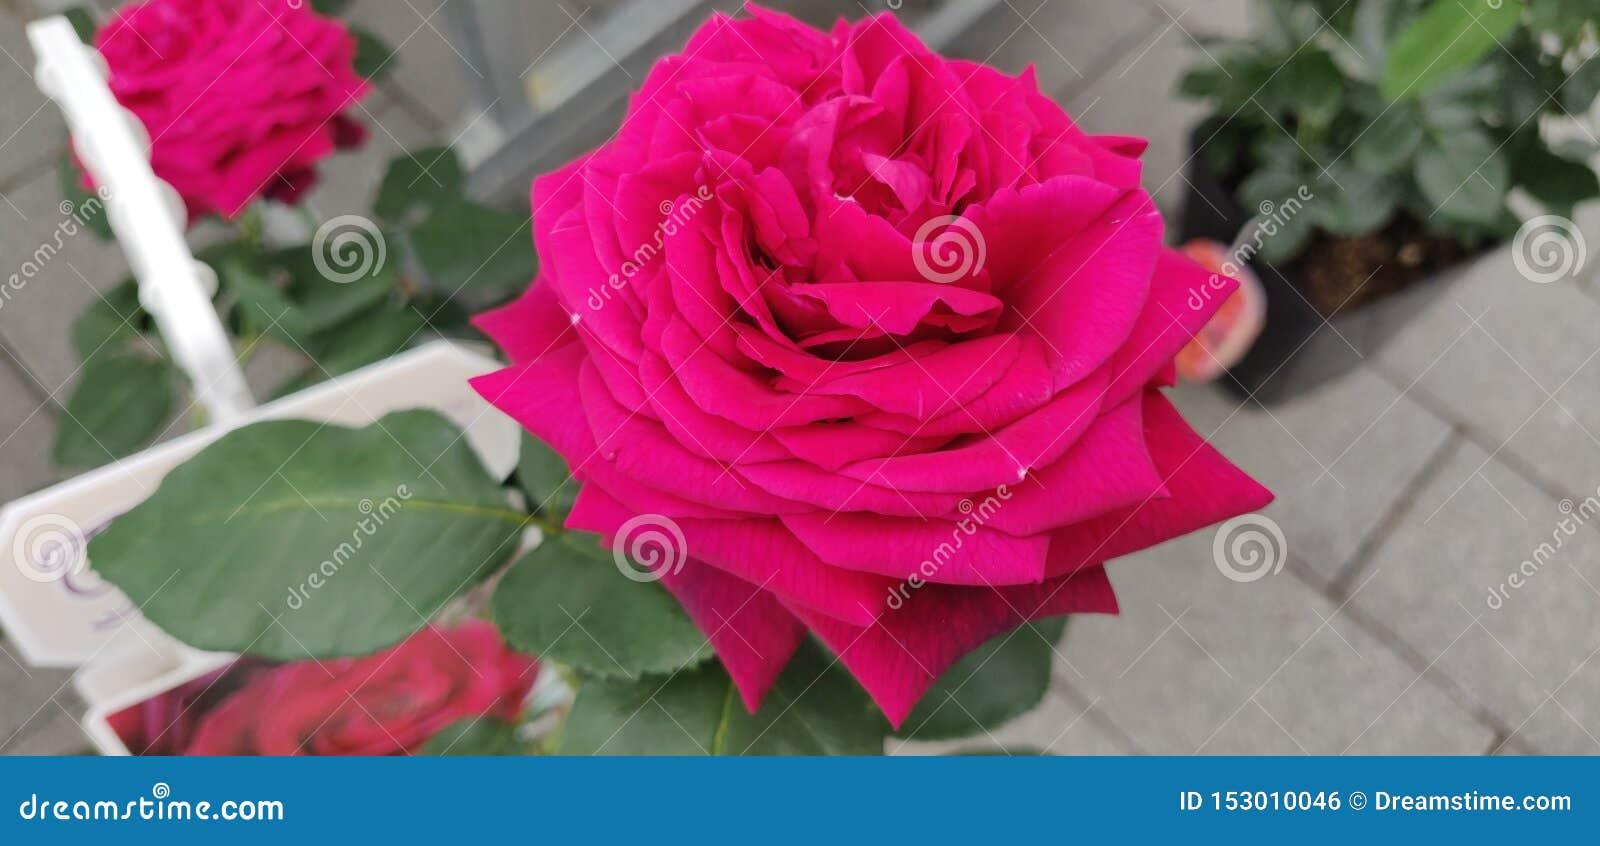 Smiling pink flower